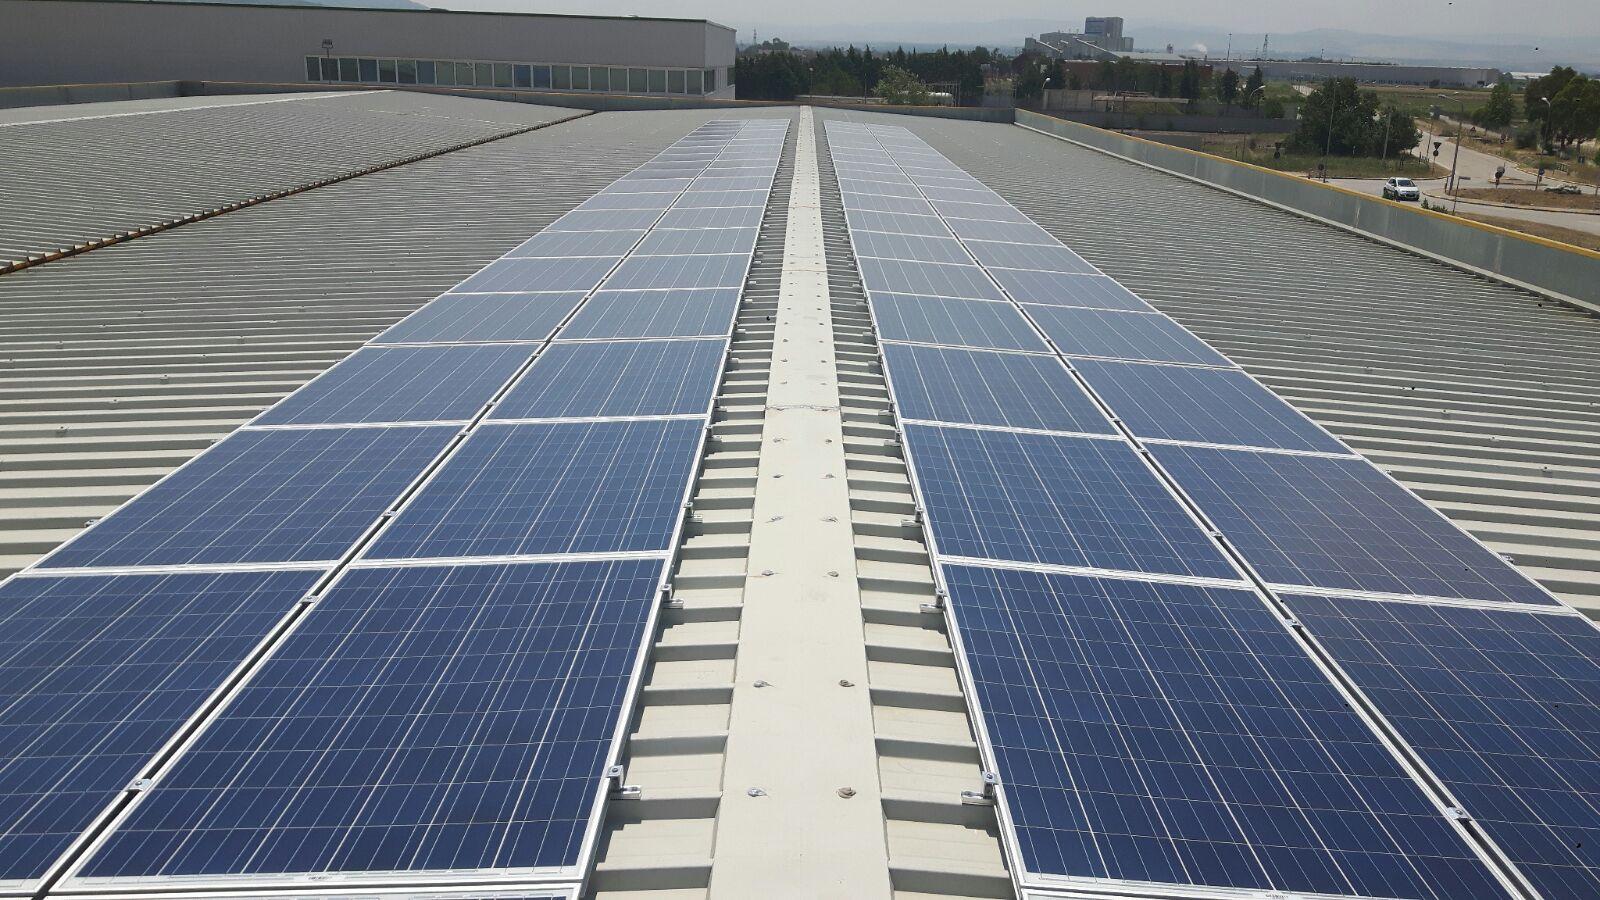 fotovoltaico cianciosi